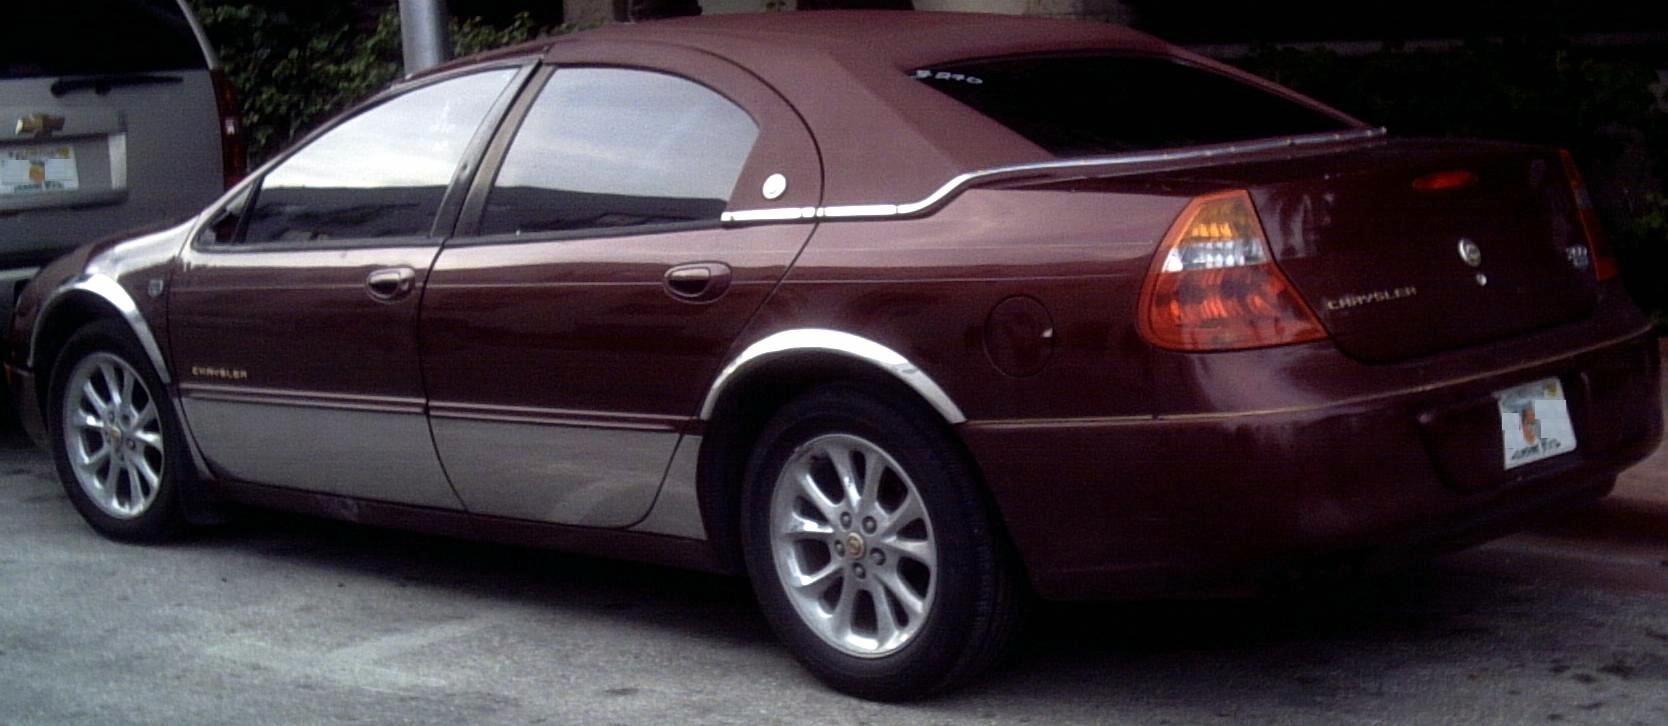 Chrysler 300 Convertible >> File:Chrysler 300M Convertible.JPG - Wikimedia Commons